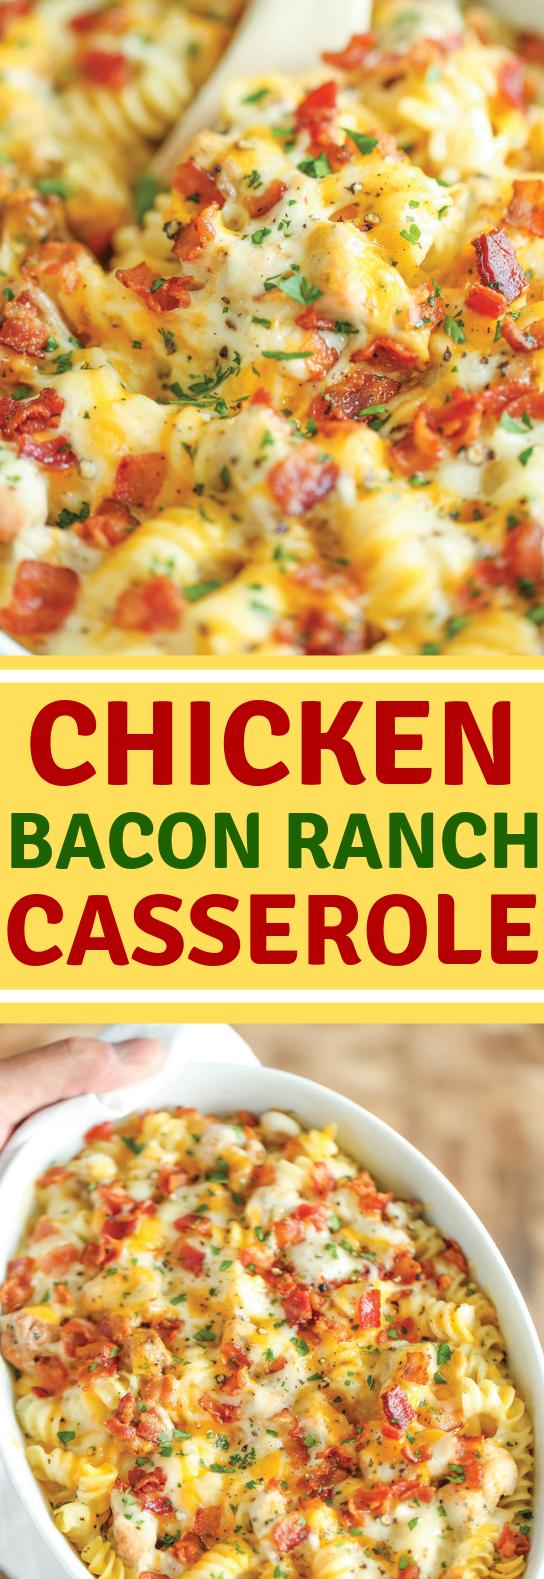 CHICKEN BACON RANCH CASSEROLE #dinner #food